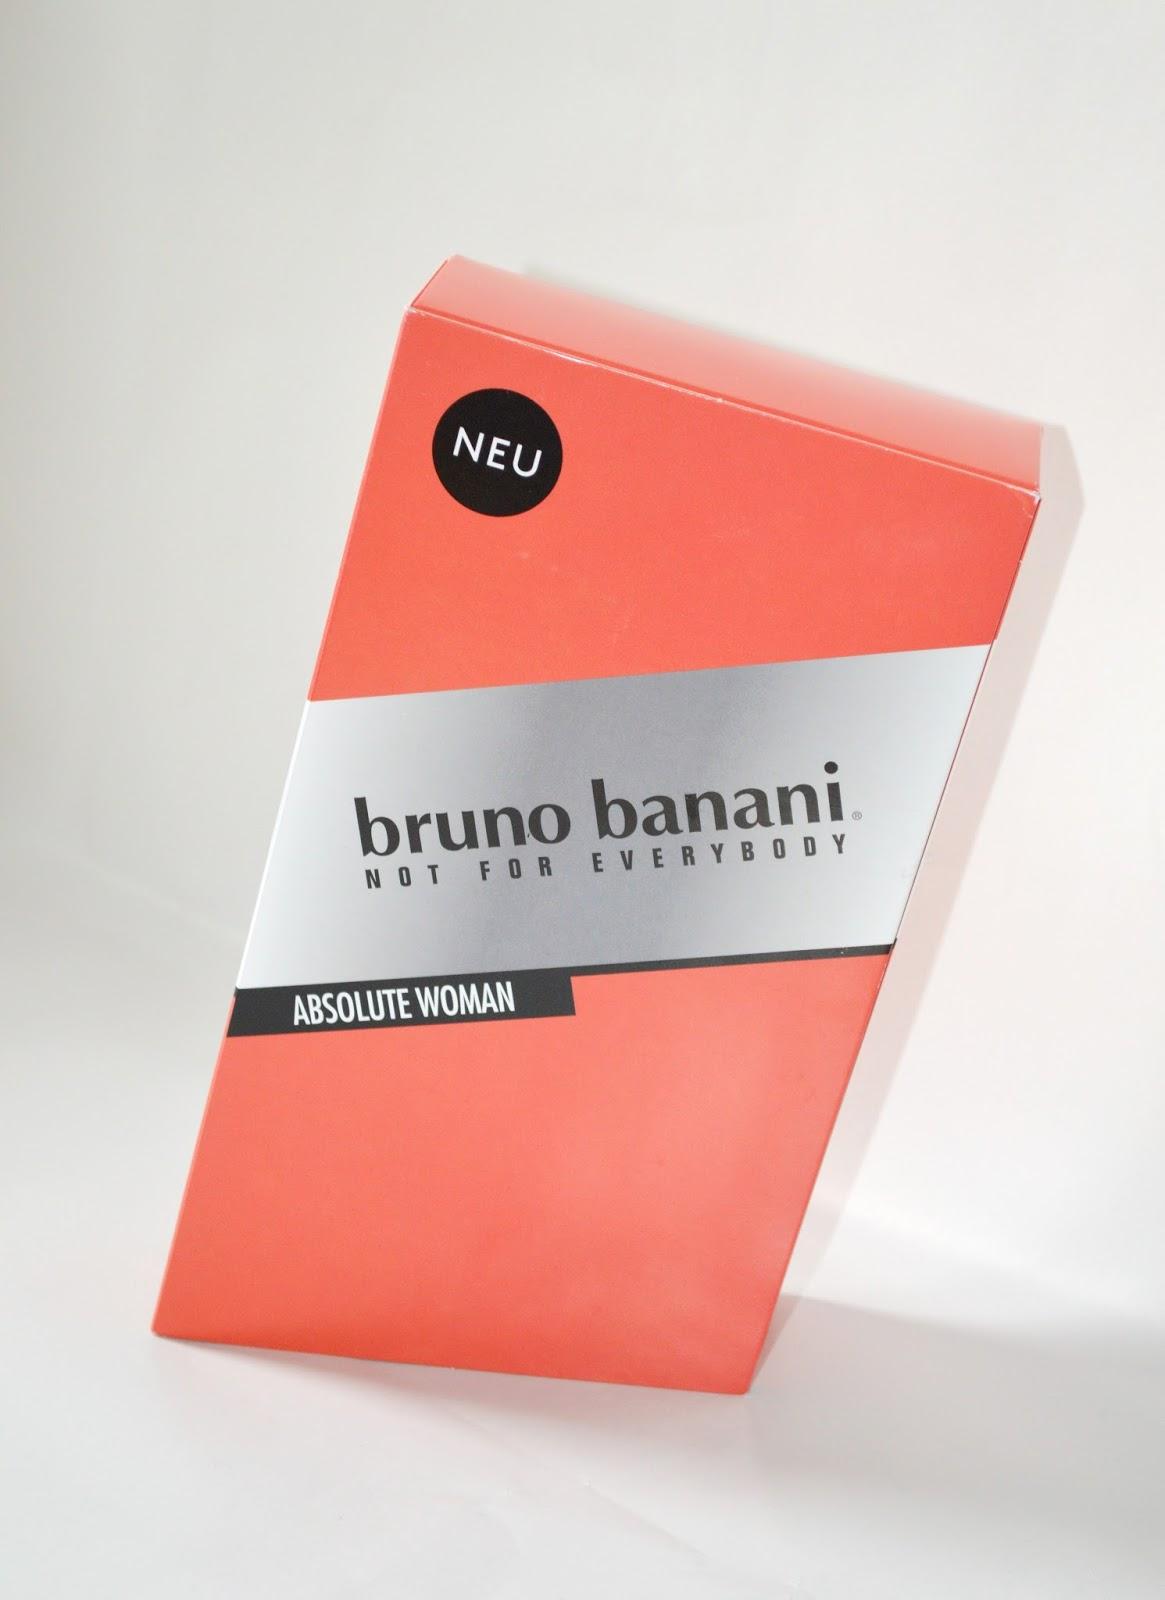 bruno banani - Absolute Woman